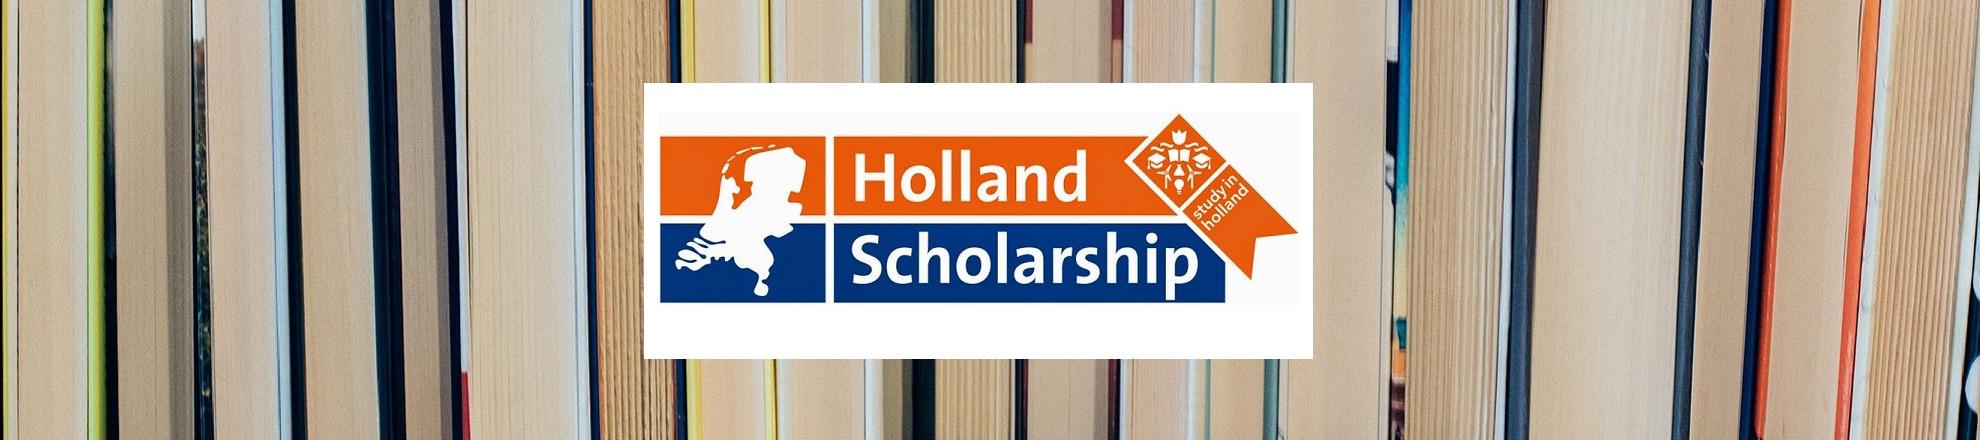 Scholarship Holland Scholarship